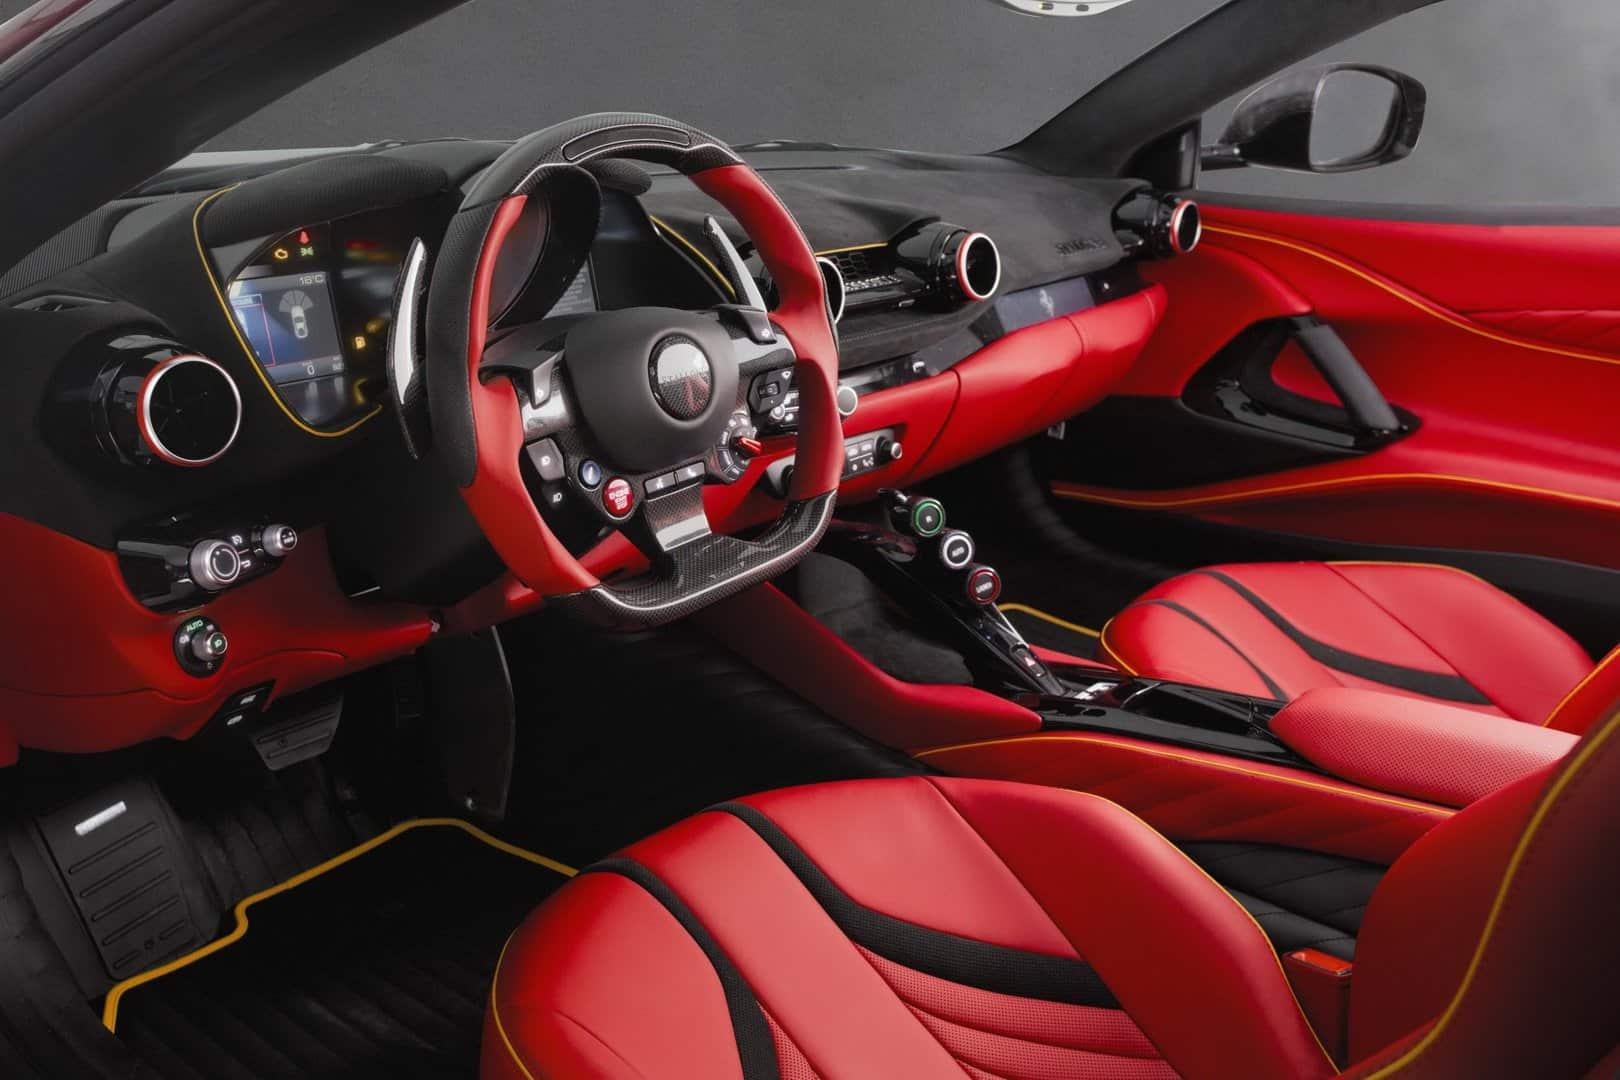 El Ferrari 812 Superfast Stallone De Mansory Es Puro Musculo